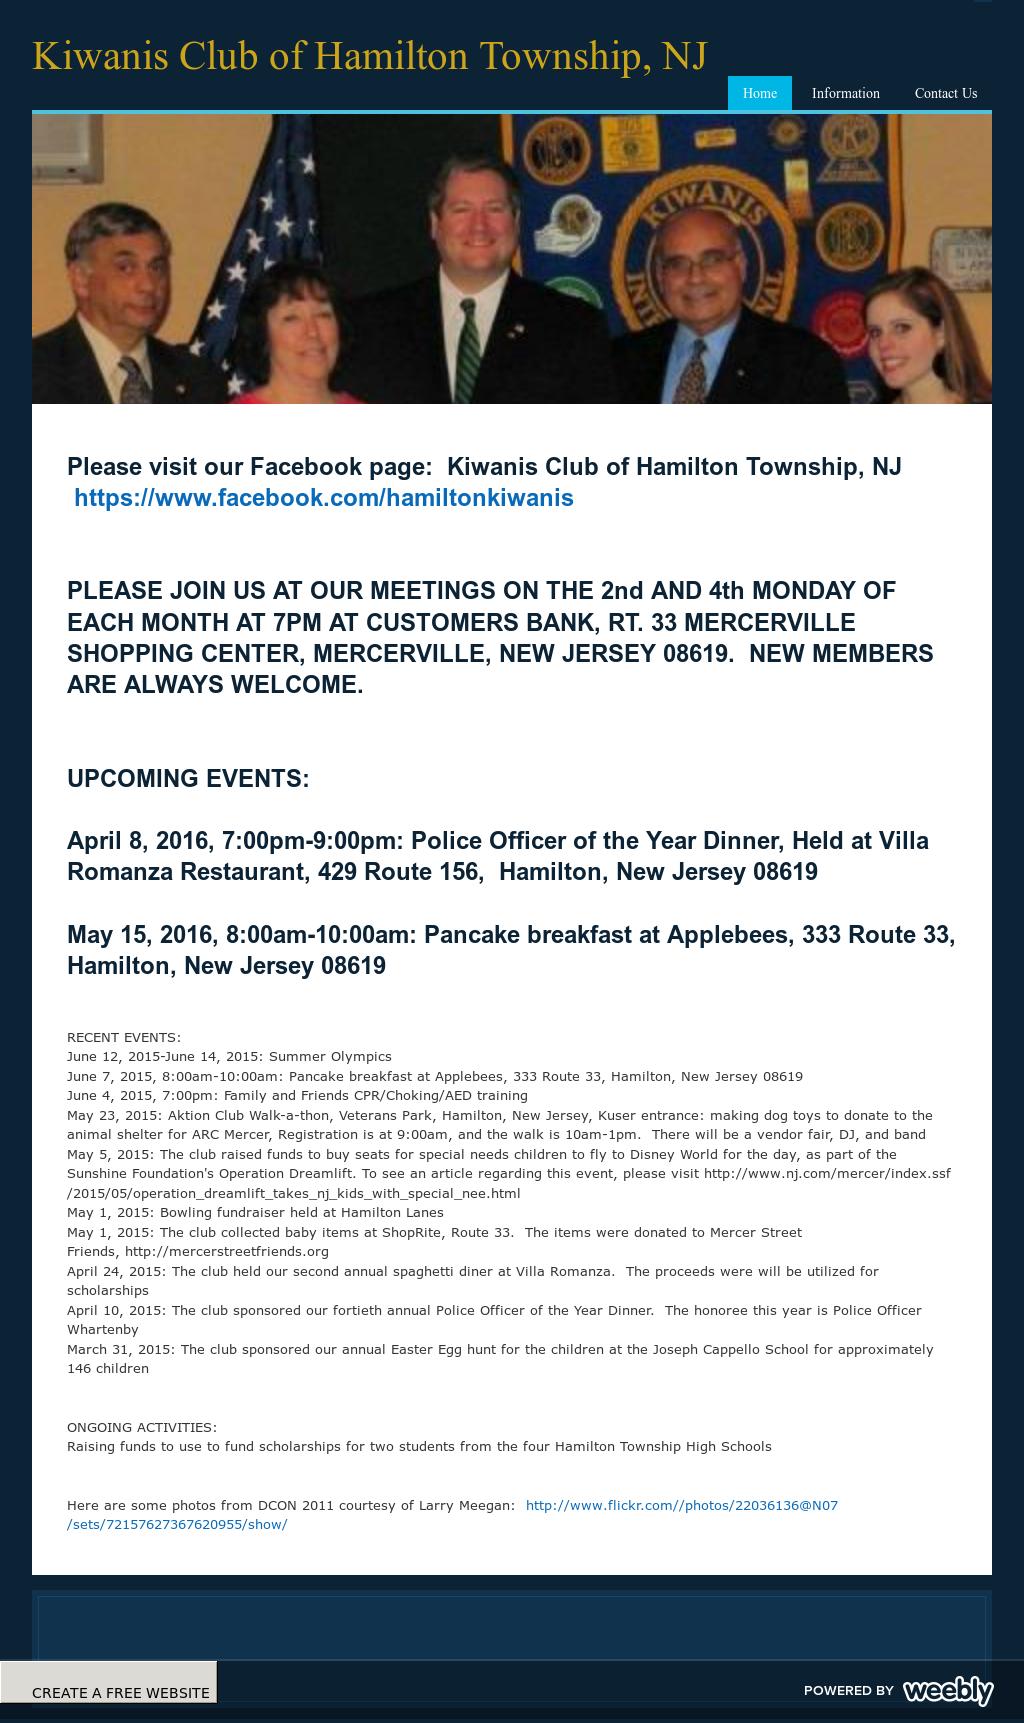 Kiwanis Club Of Hamilton Township, Nj Competitors, Revenue and